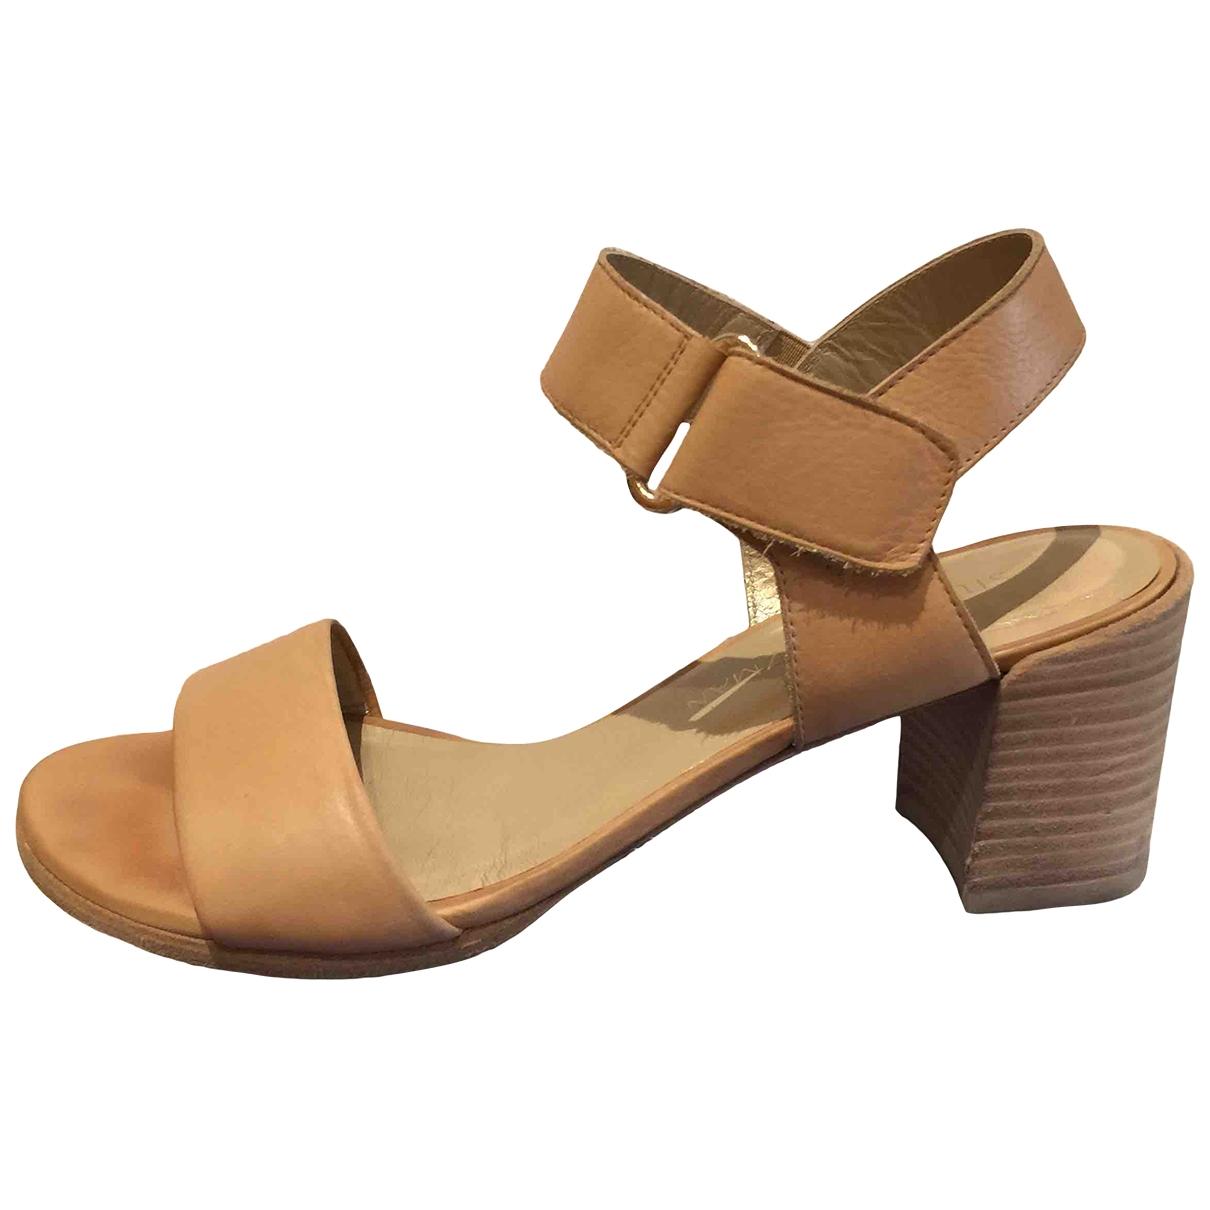 Stuart Weitzman \N Camel Leather Sandals for Women 38.5 EU